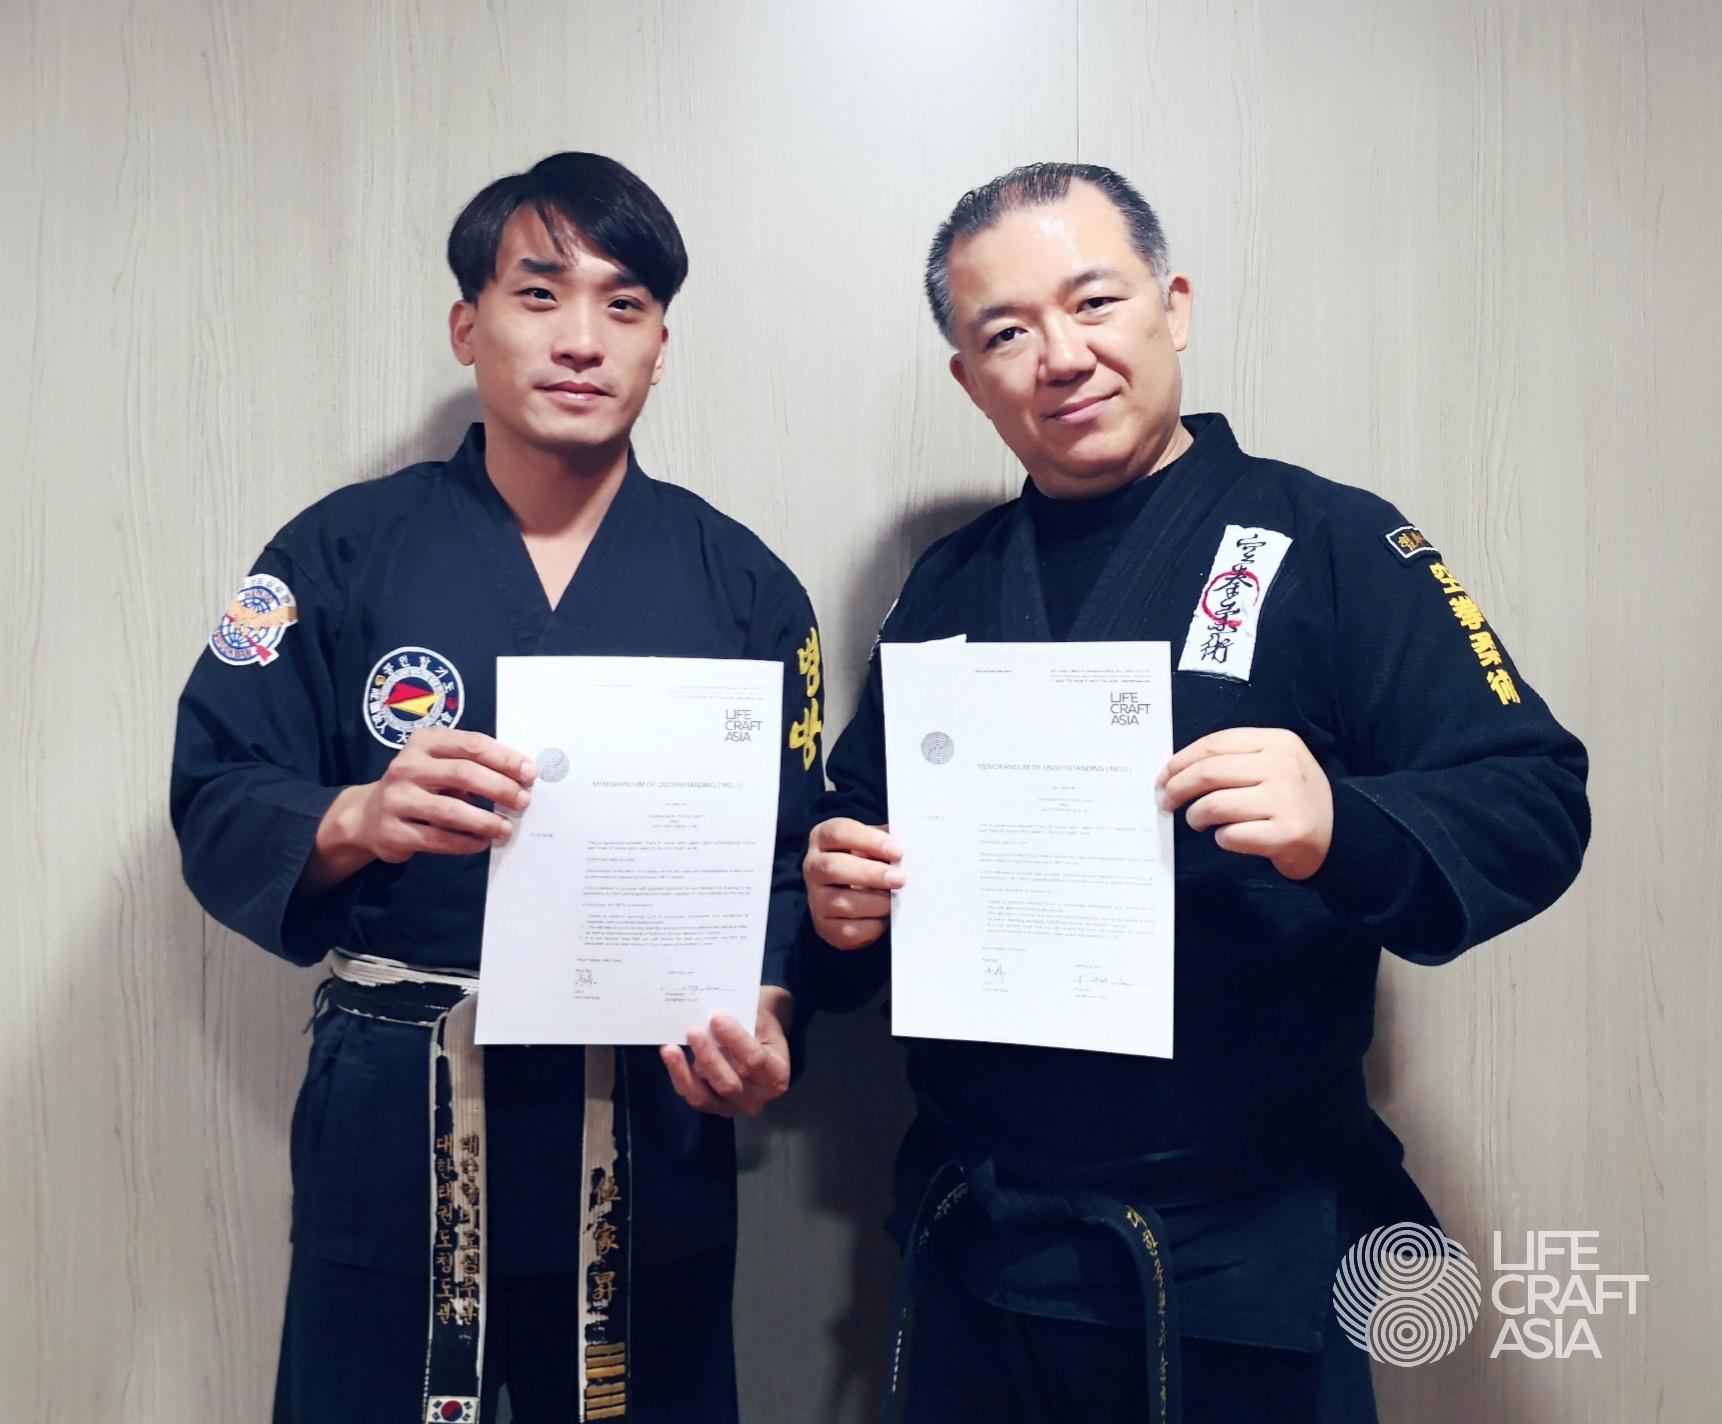 (LEFT) MST ROY NG - CEO OF LIFECRAFT ASIA, (RIGHT) GM KANG JUN - PRESIDENT OF GKYS.